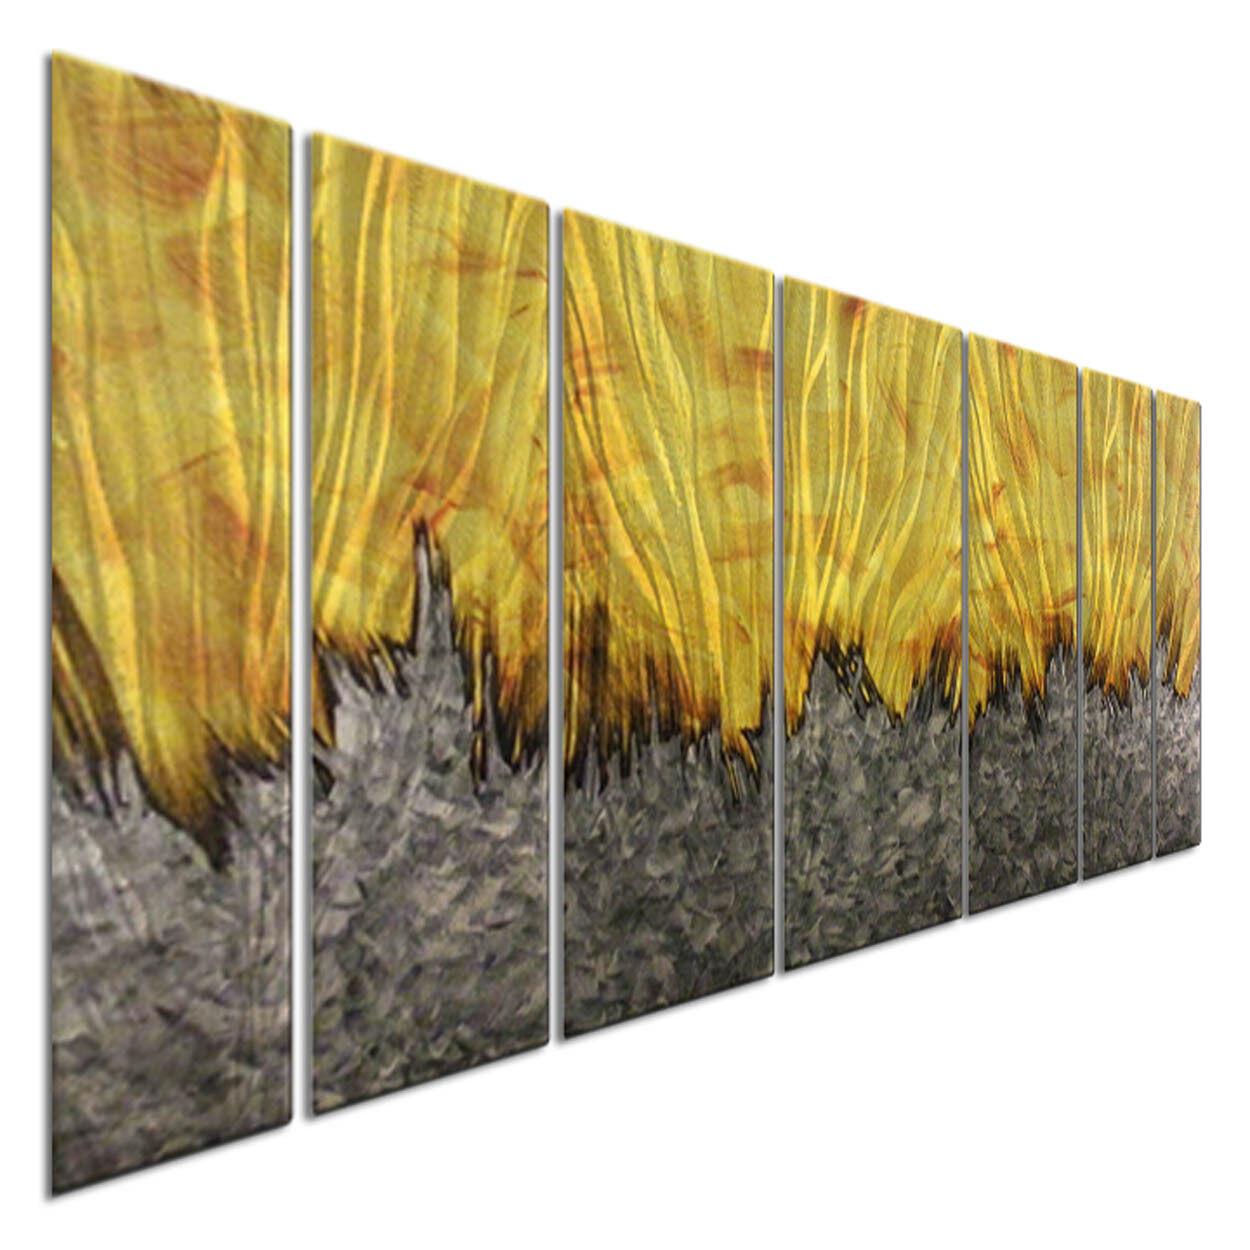 All My Walls STR00002 Justin Strom Inferno | eBay